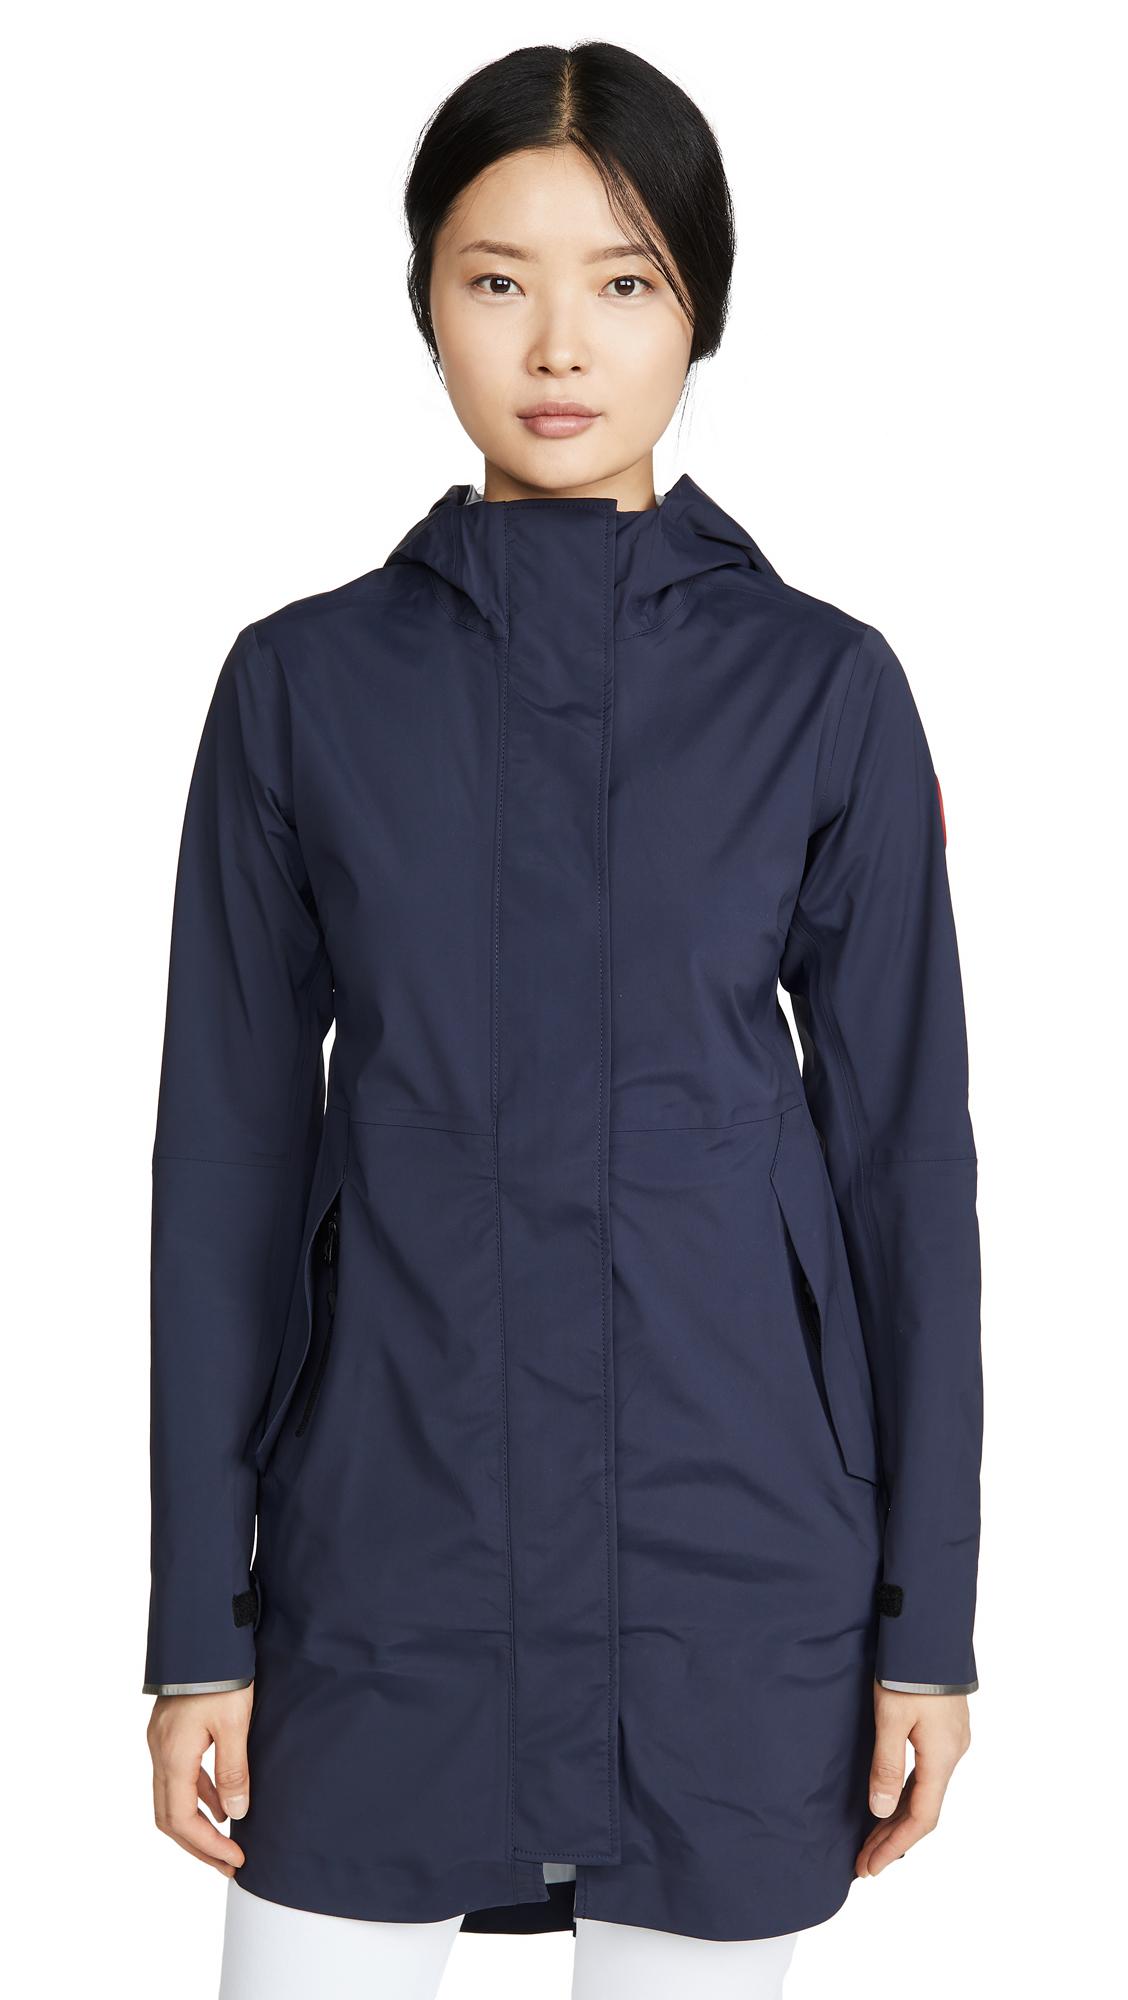 Buy Canada Goose Salida Jacket online beautiful Canada Goose Jackets, Coats, Trench Coats